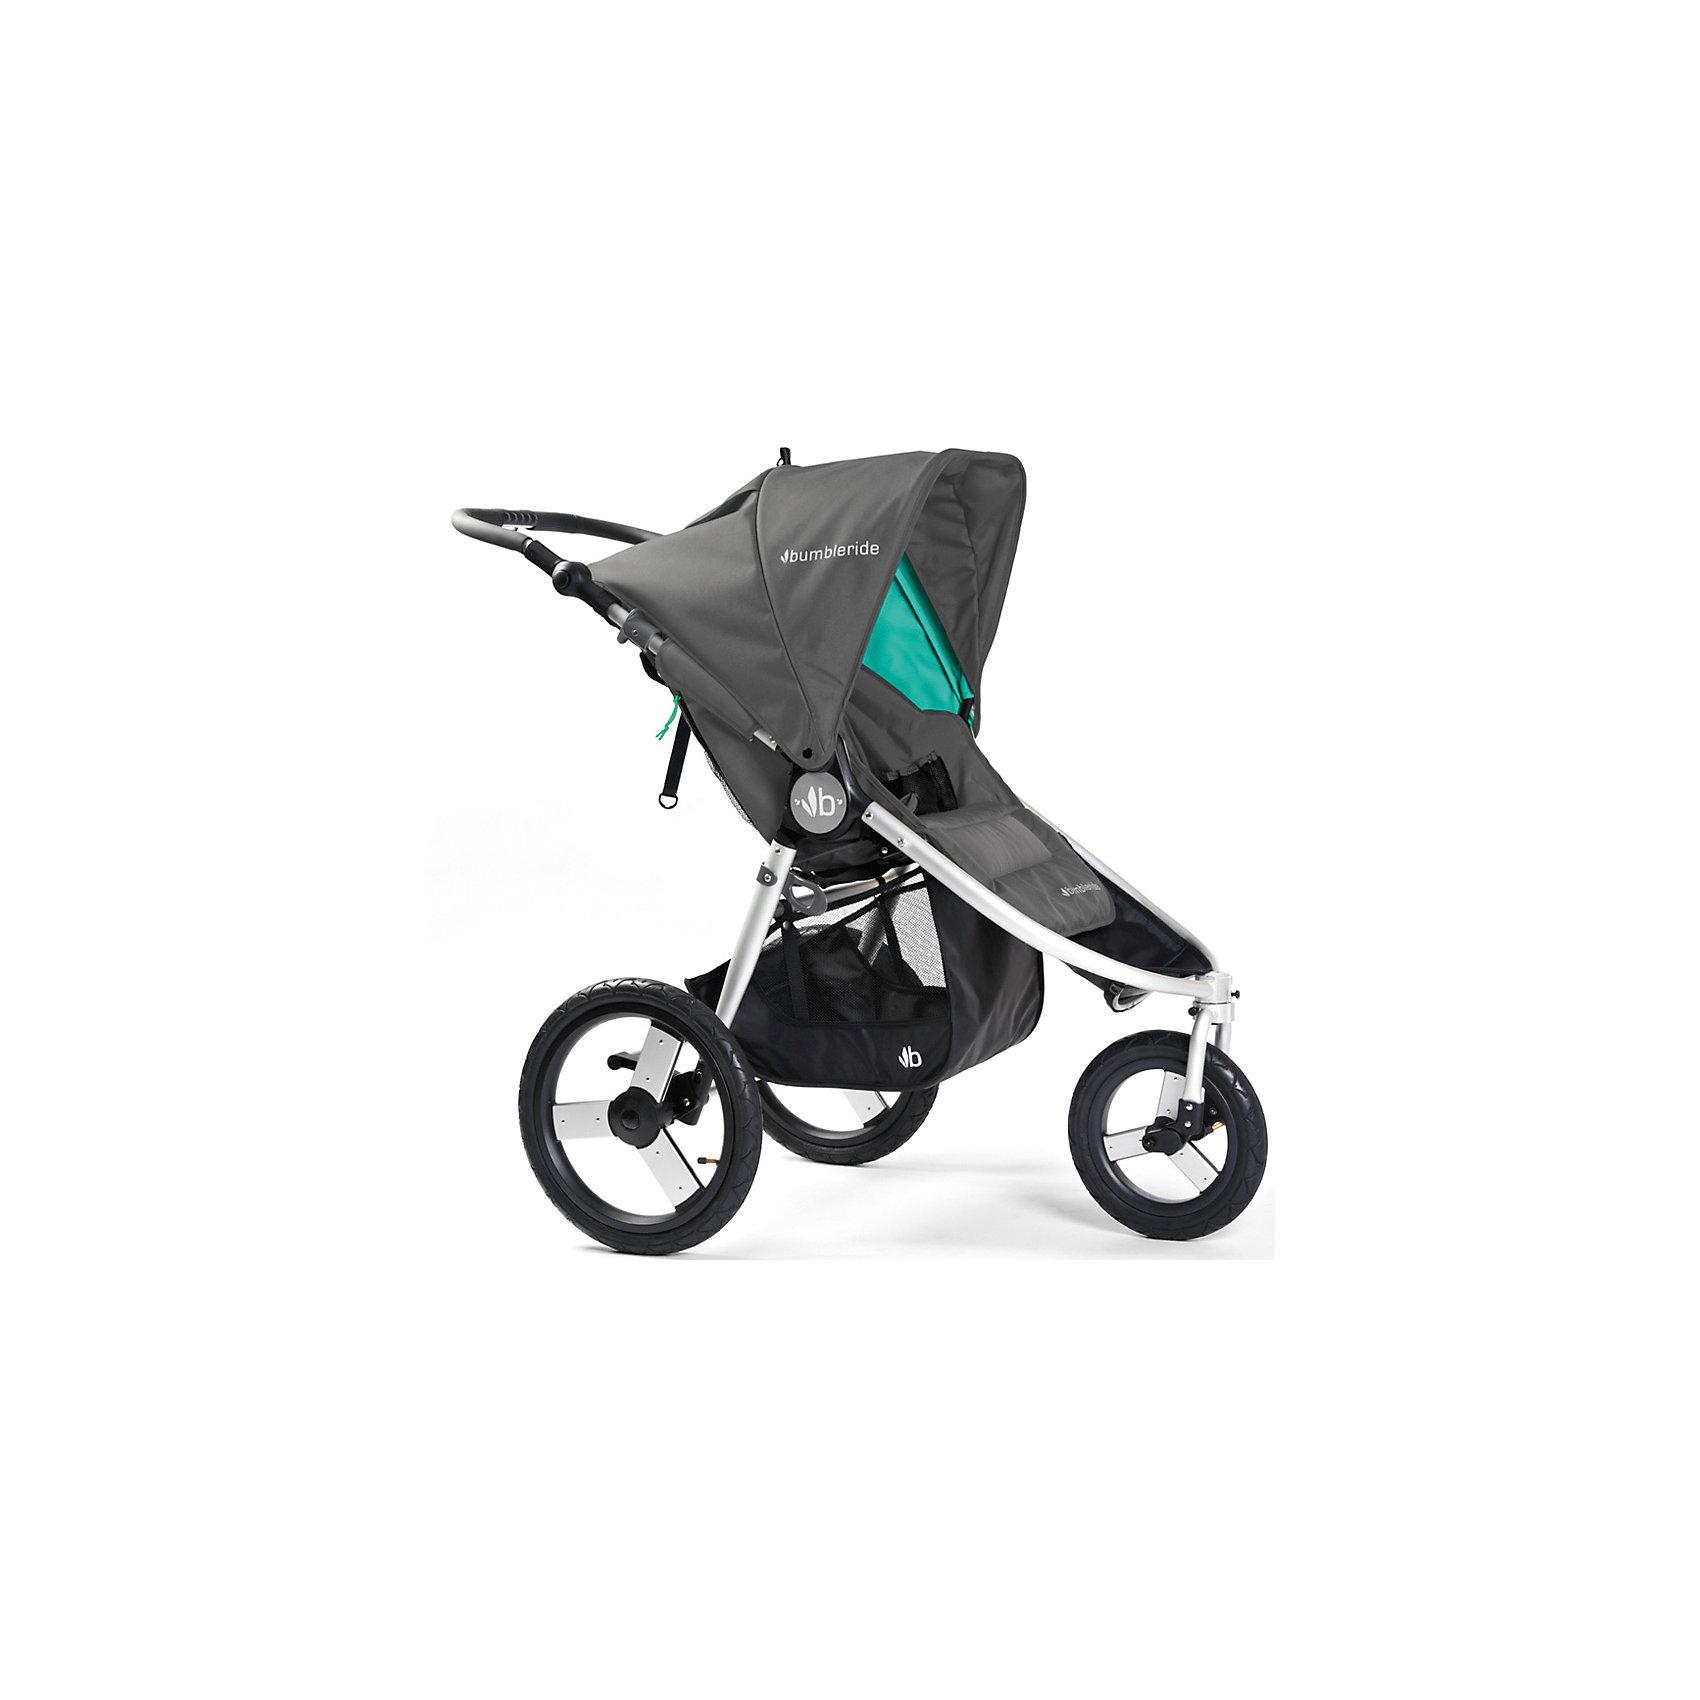 Bumbleride Прогулочная коляска Speed, Bumbleride , dawn grey